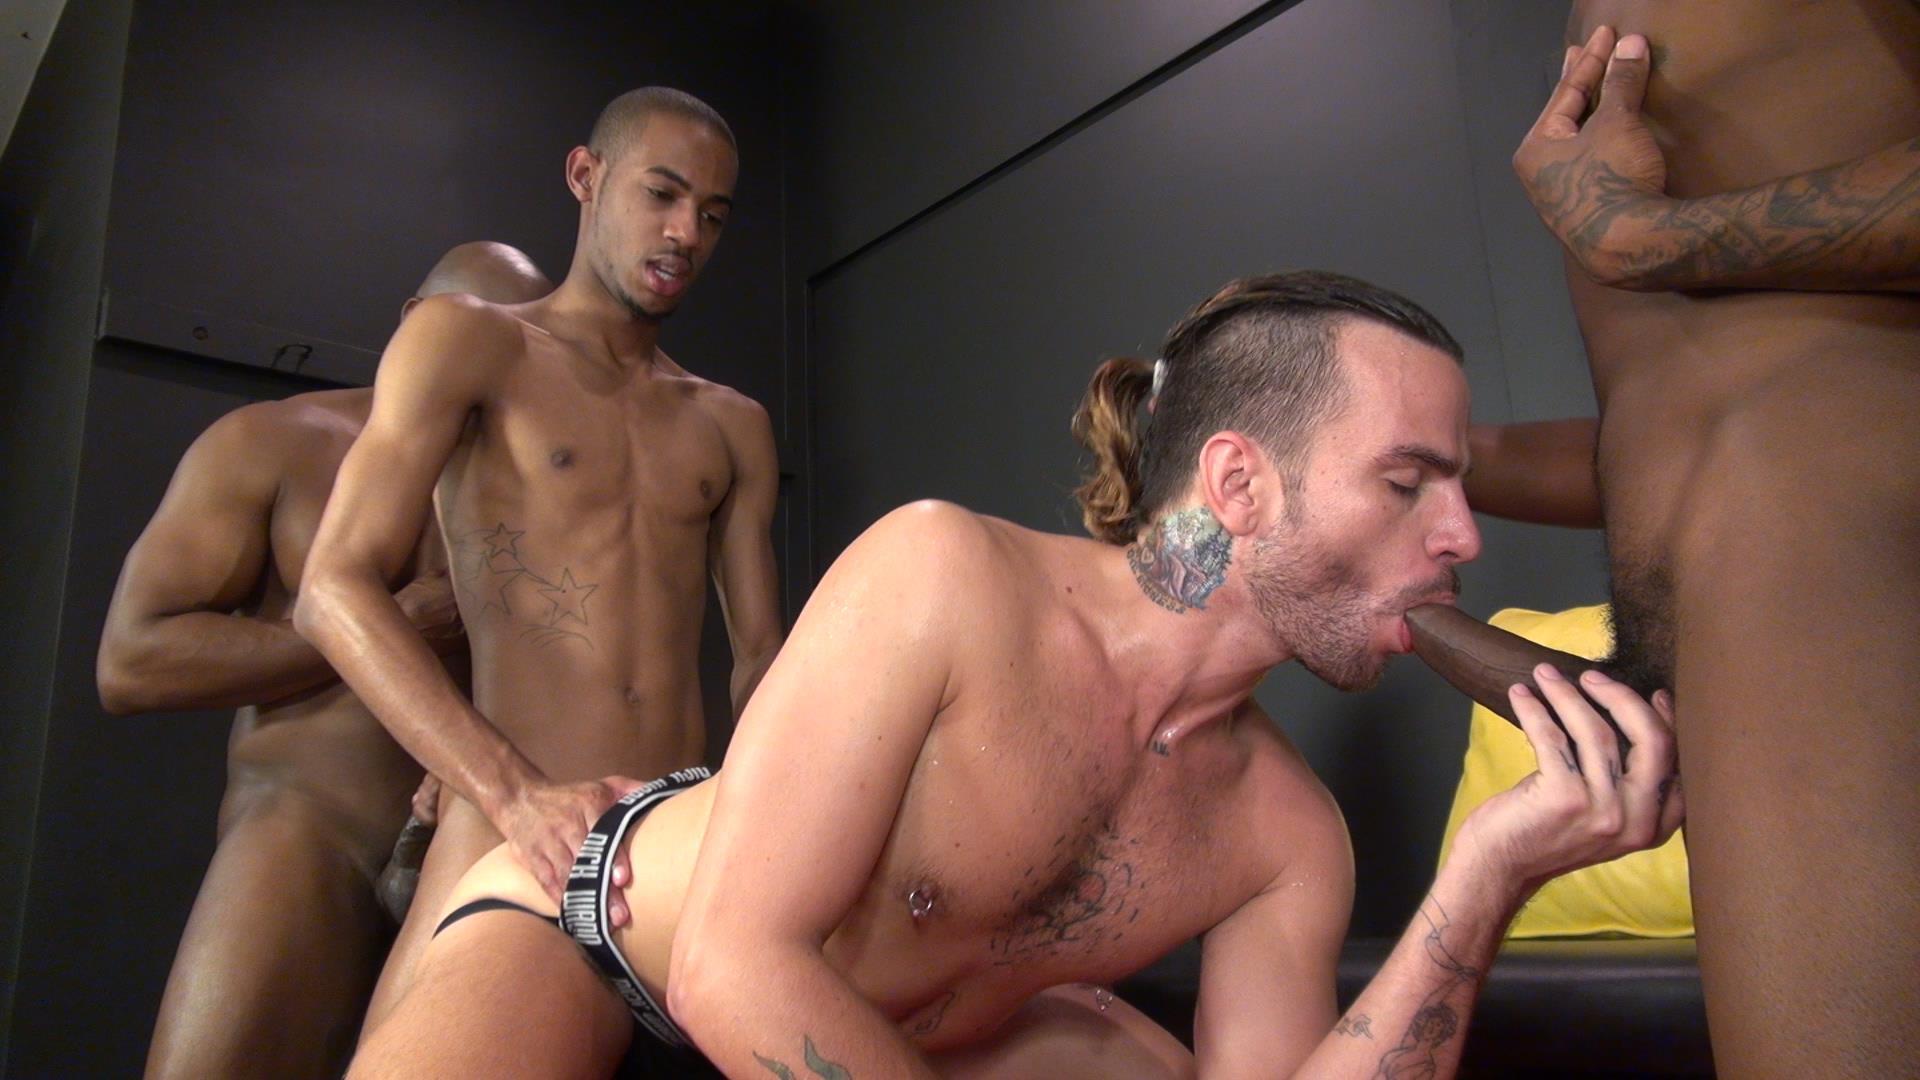 Raw-and-Rough-Champ-Robinson-Lukas-Cipriani-Knockout-Tigger-Redd-BBBH-Amateur-Gay-Porn-18 White Boy Gets A Breeding By Three Big Black Dicks